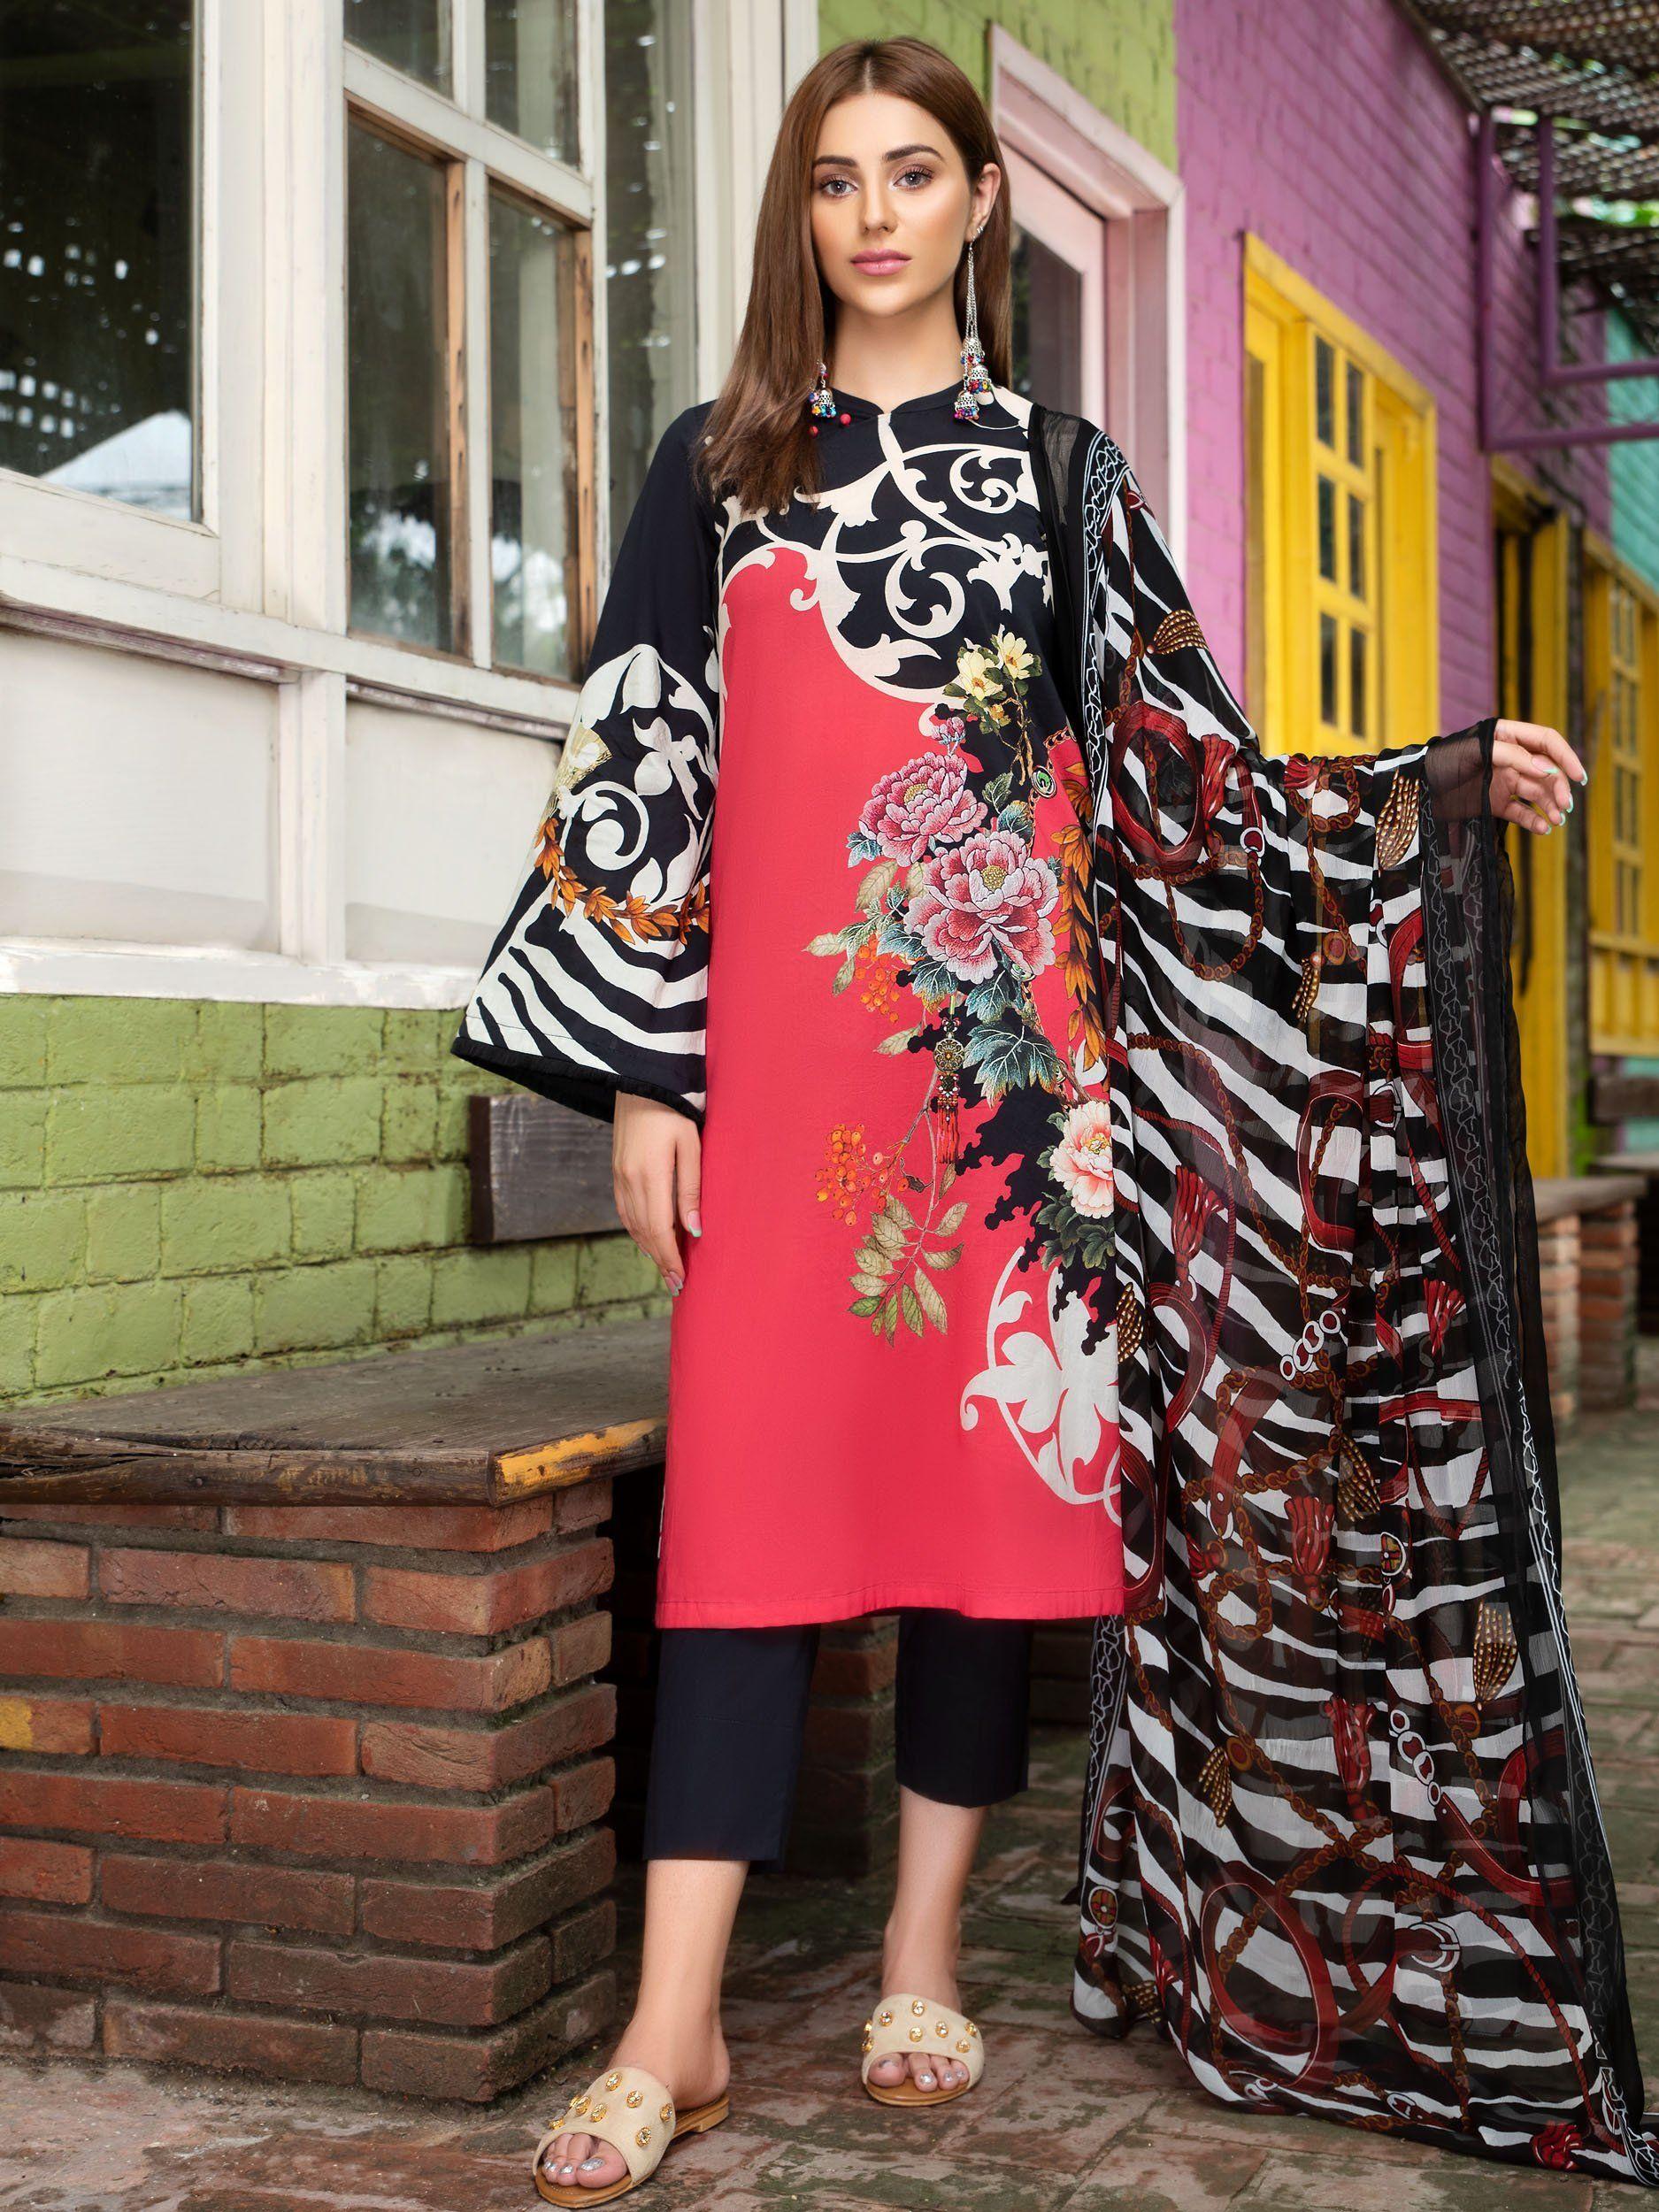 2pc INDIAN PAKISTANI wedding party churidaar Trouser Kameez suit Asian Dress